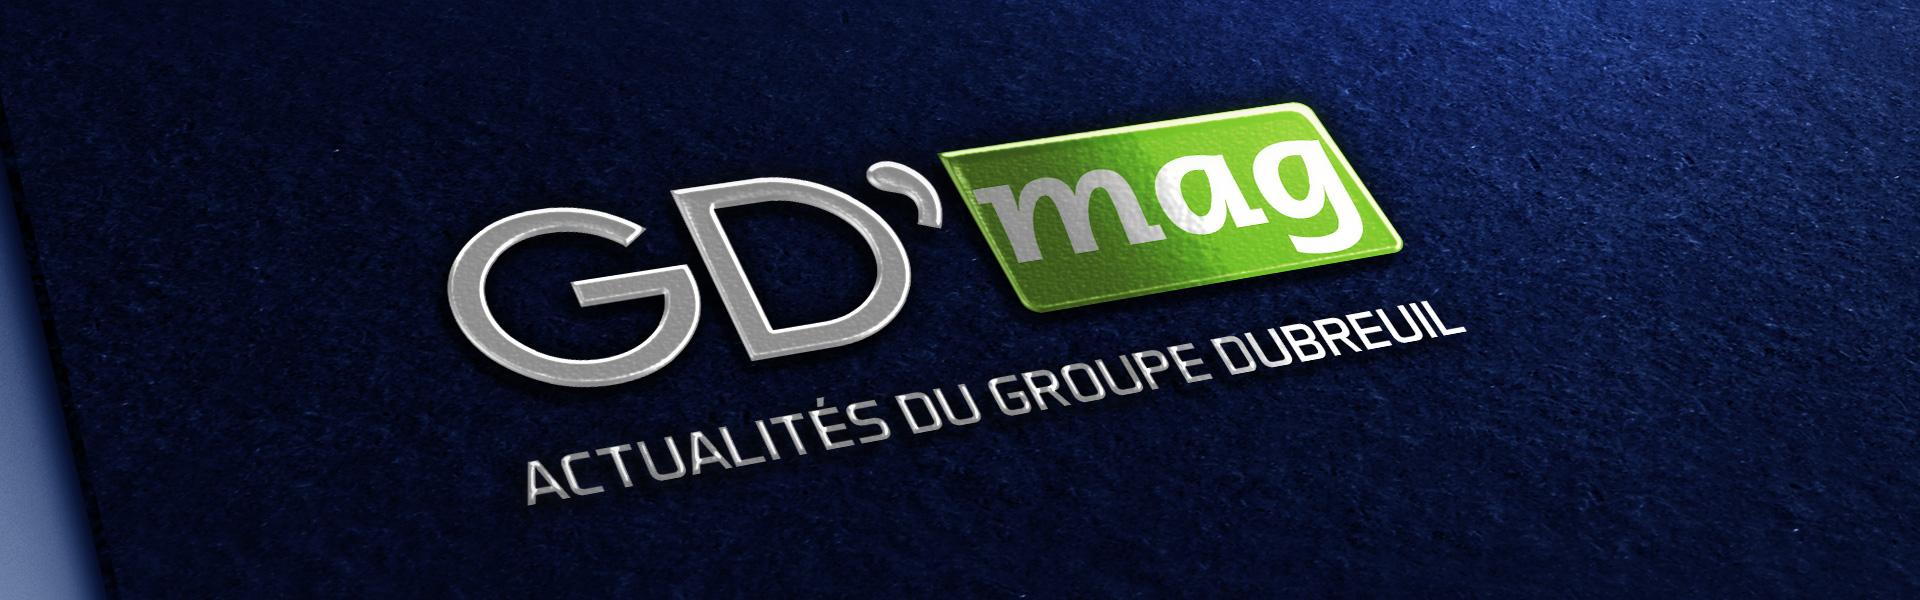 GD'Mag